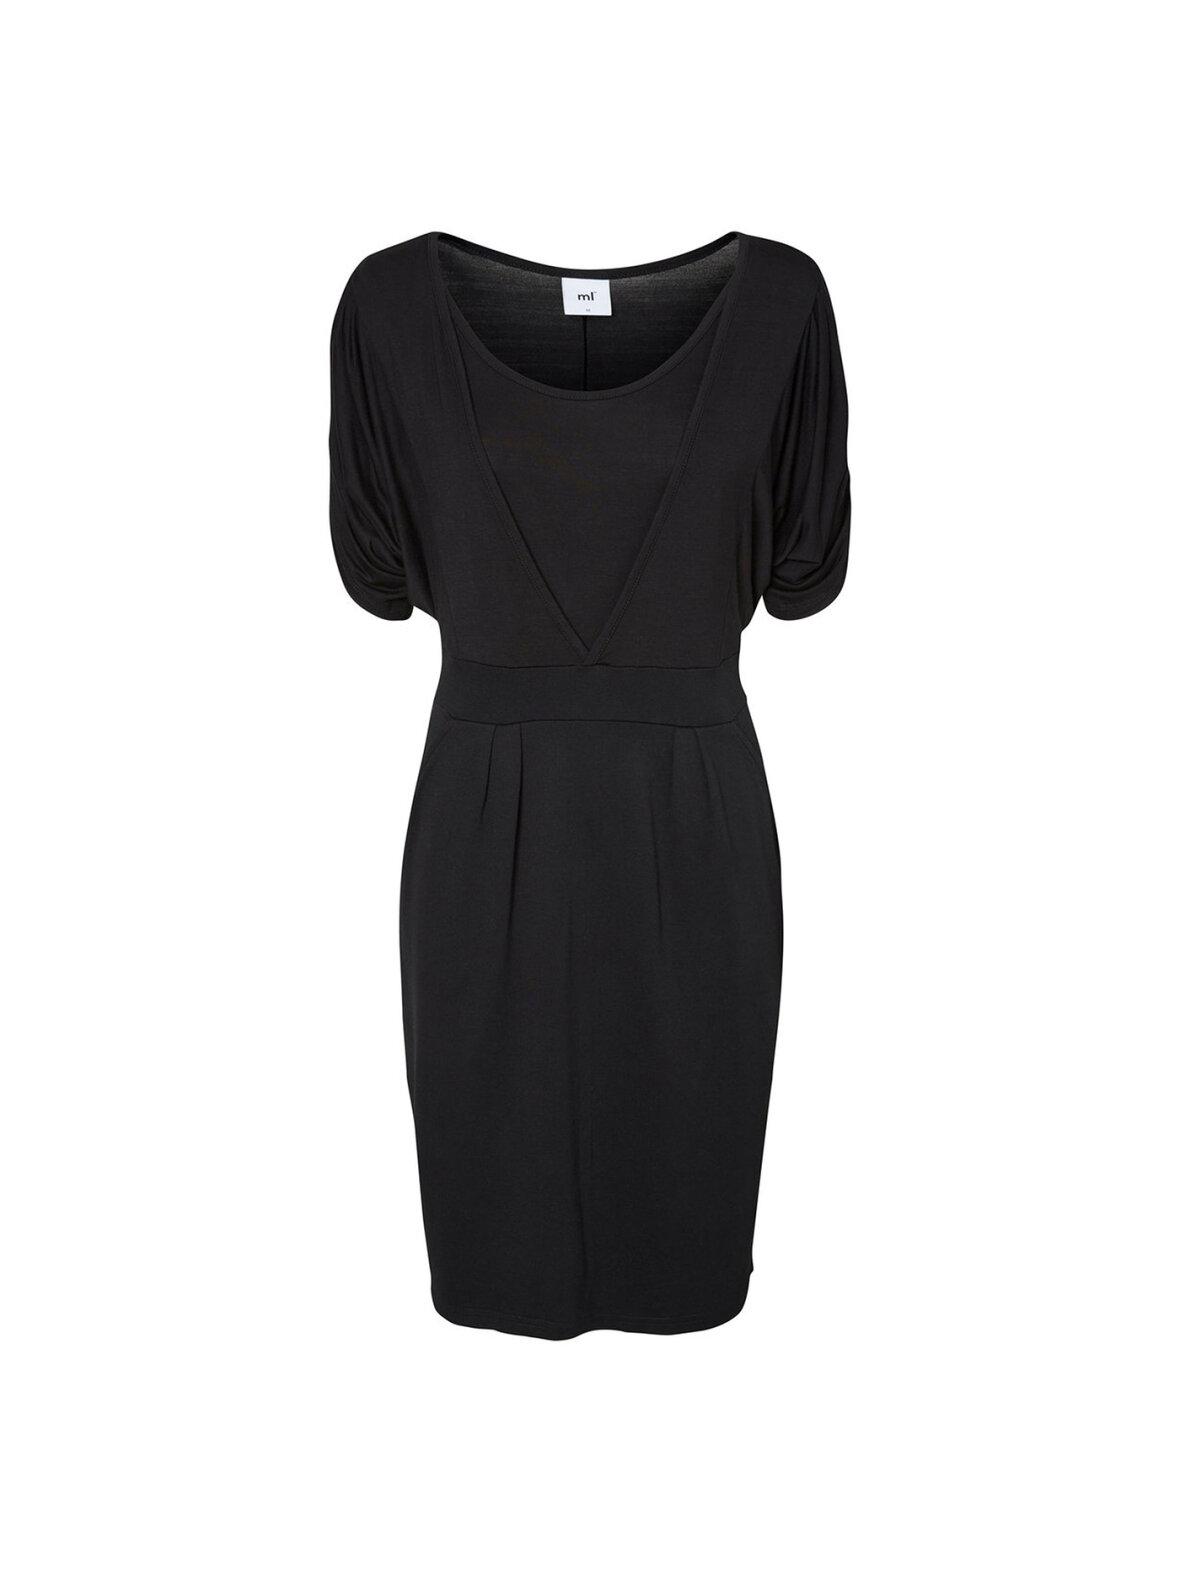 b3c2c4ffa659 Enula9 - Gravid kjoler - Mamalicious - Bruna Tess Jersey kjole sort